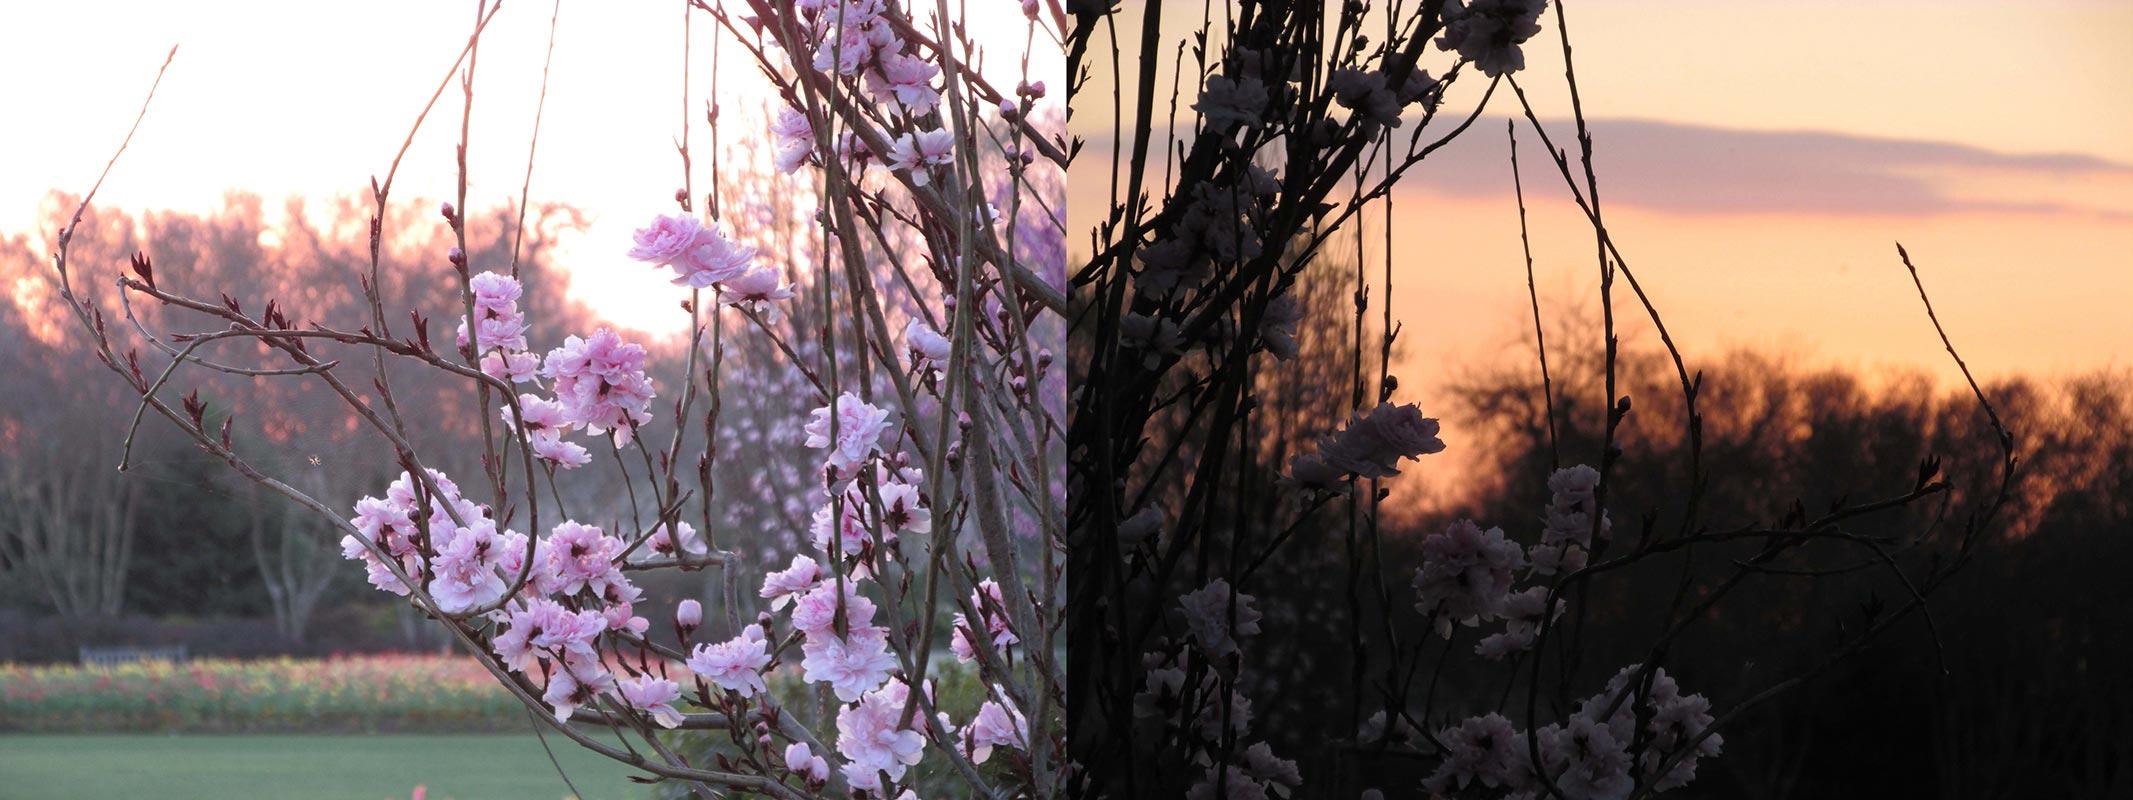 Caitlyn Nygaard - Sunset Flowers